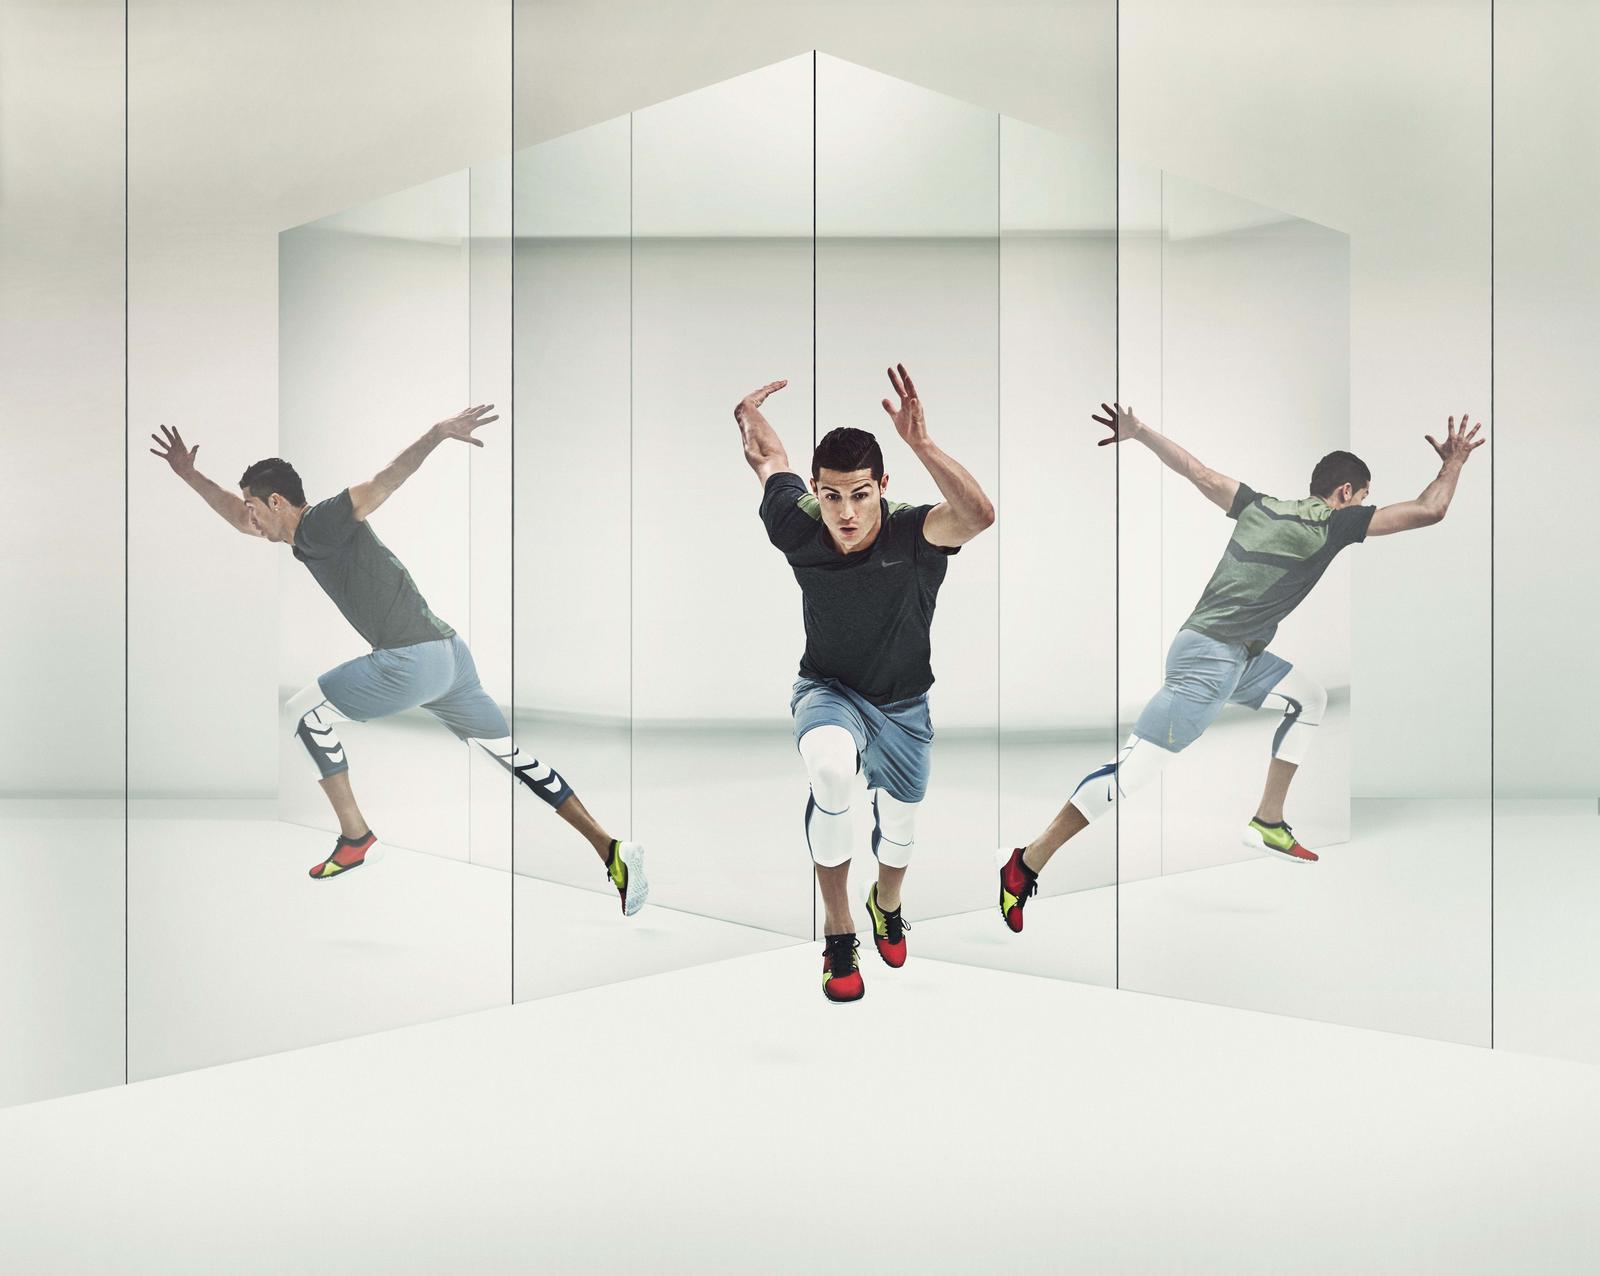 Cristiano Ronaldo + Nike Training Free TR 3